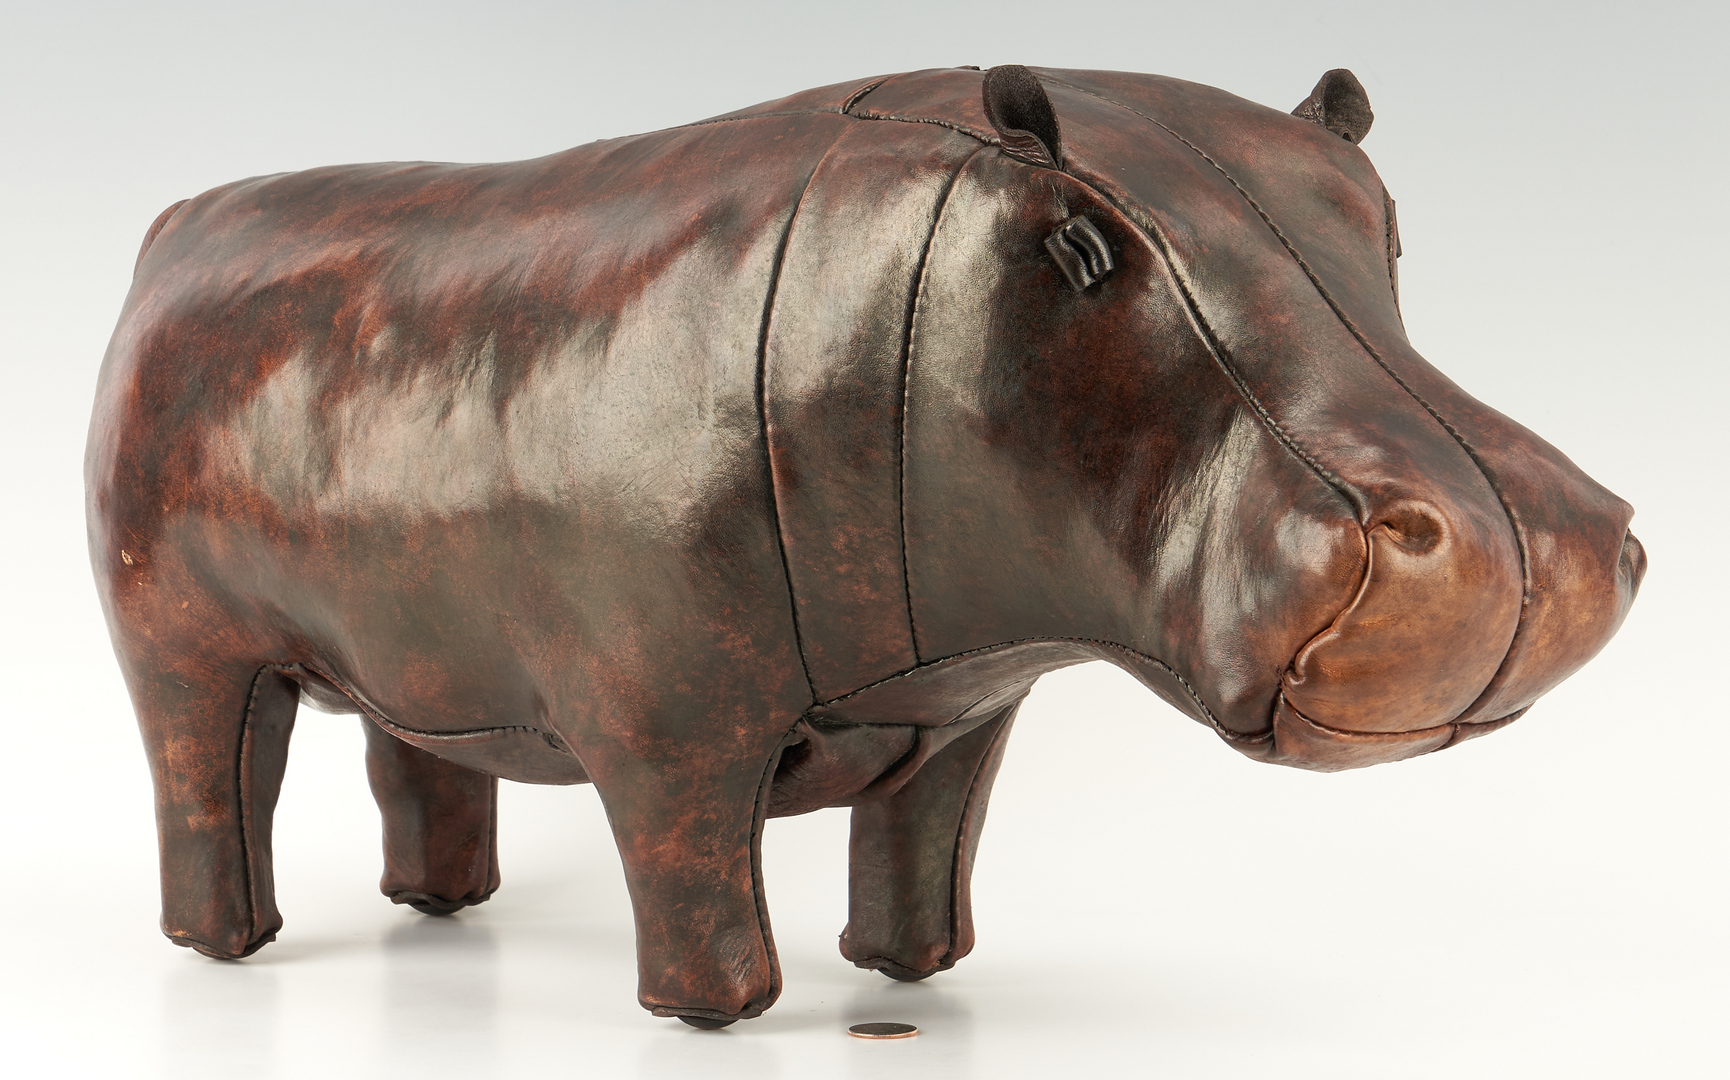 Lot 864: Leather Hippo Foot Stool, Attrib. to Dmitri Omersa